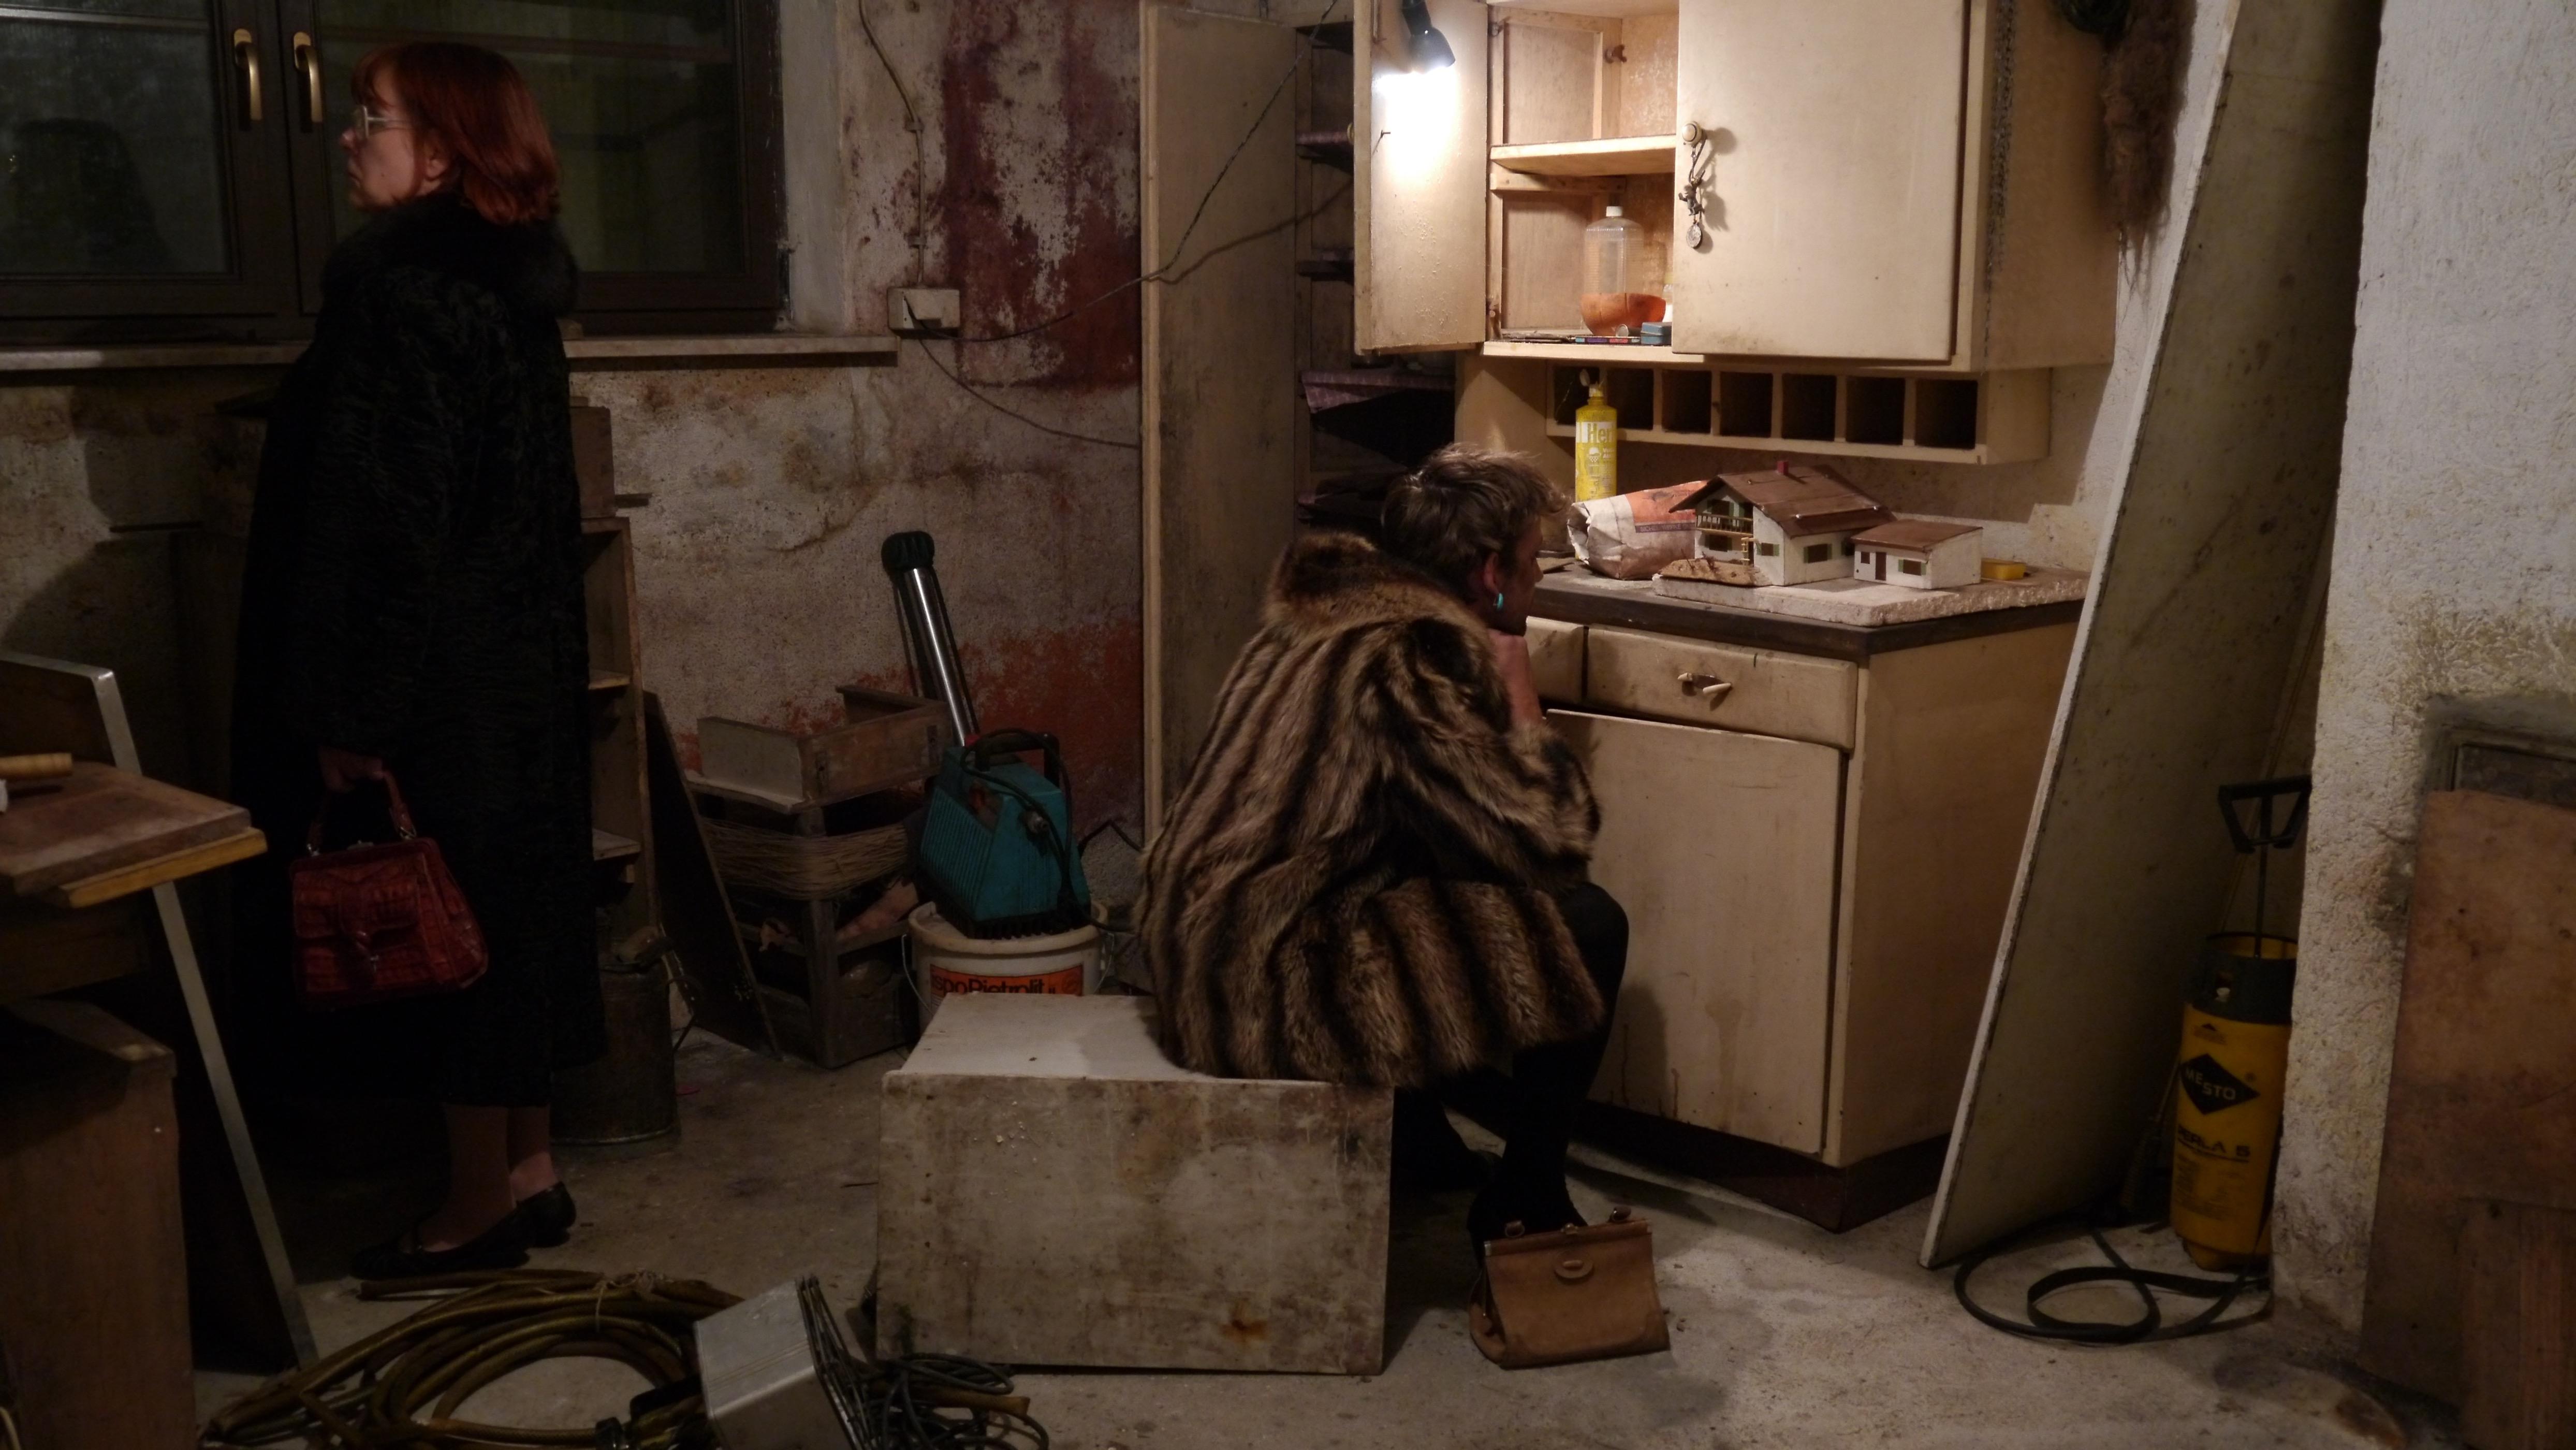 House, Mother, Son, C-Print, 70 x 40 cm, 2012